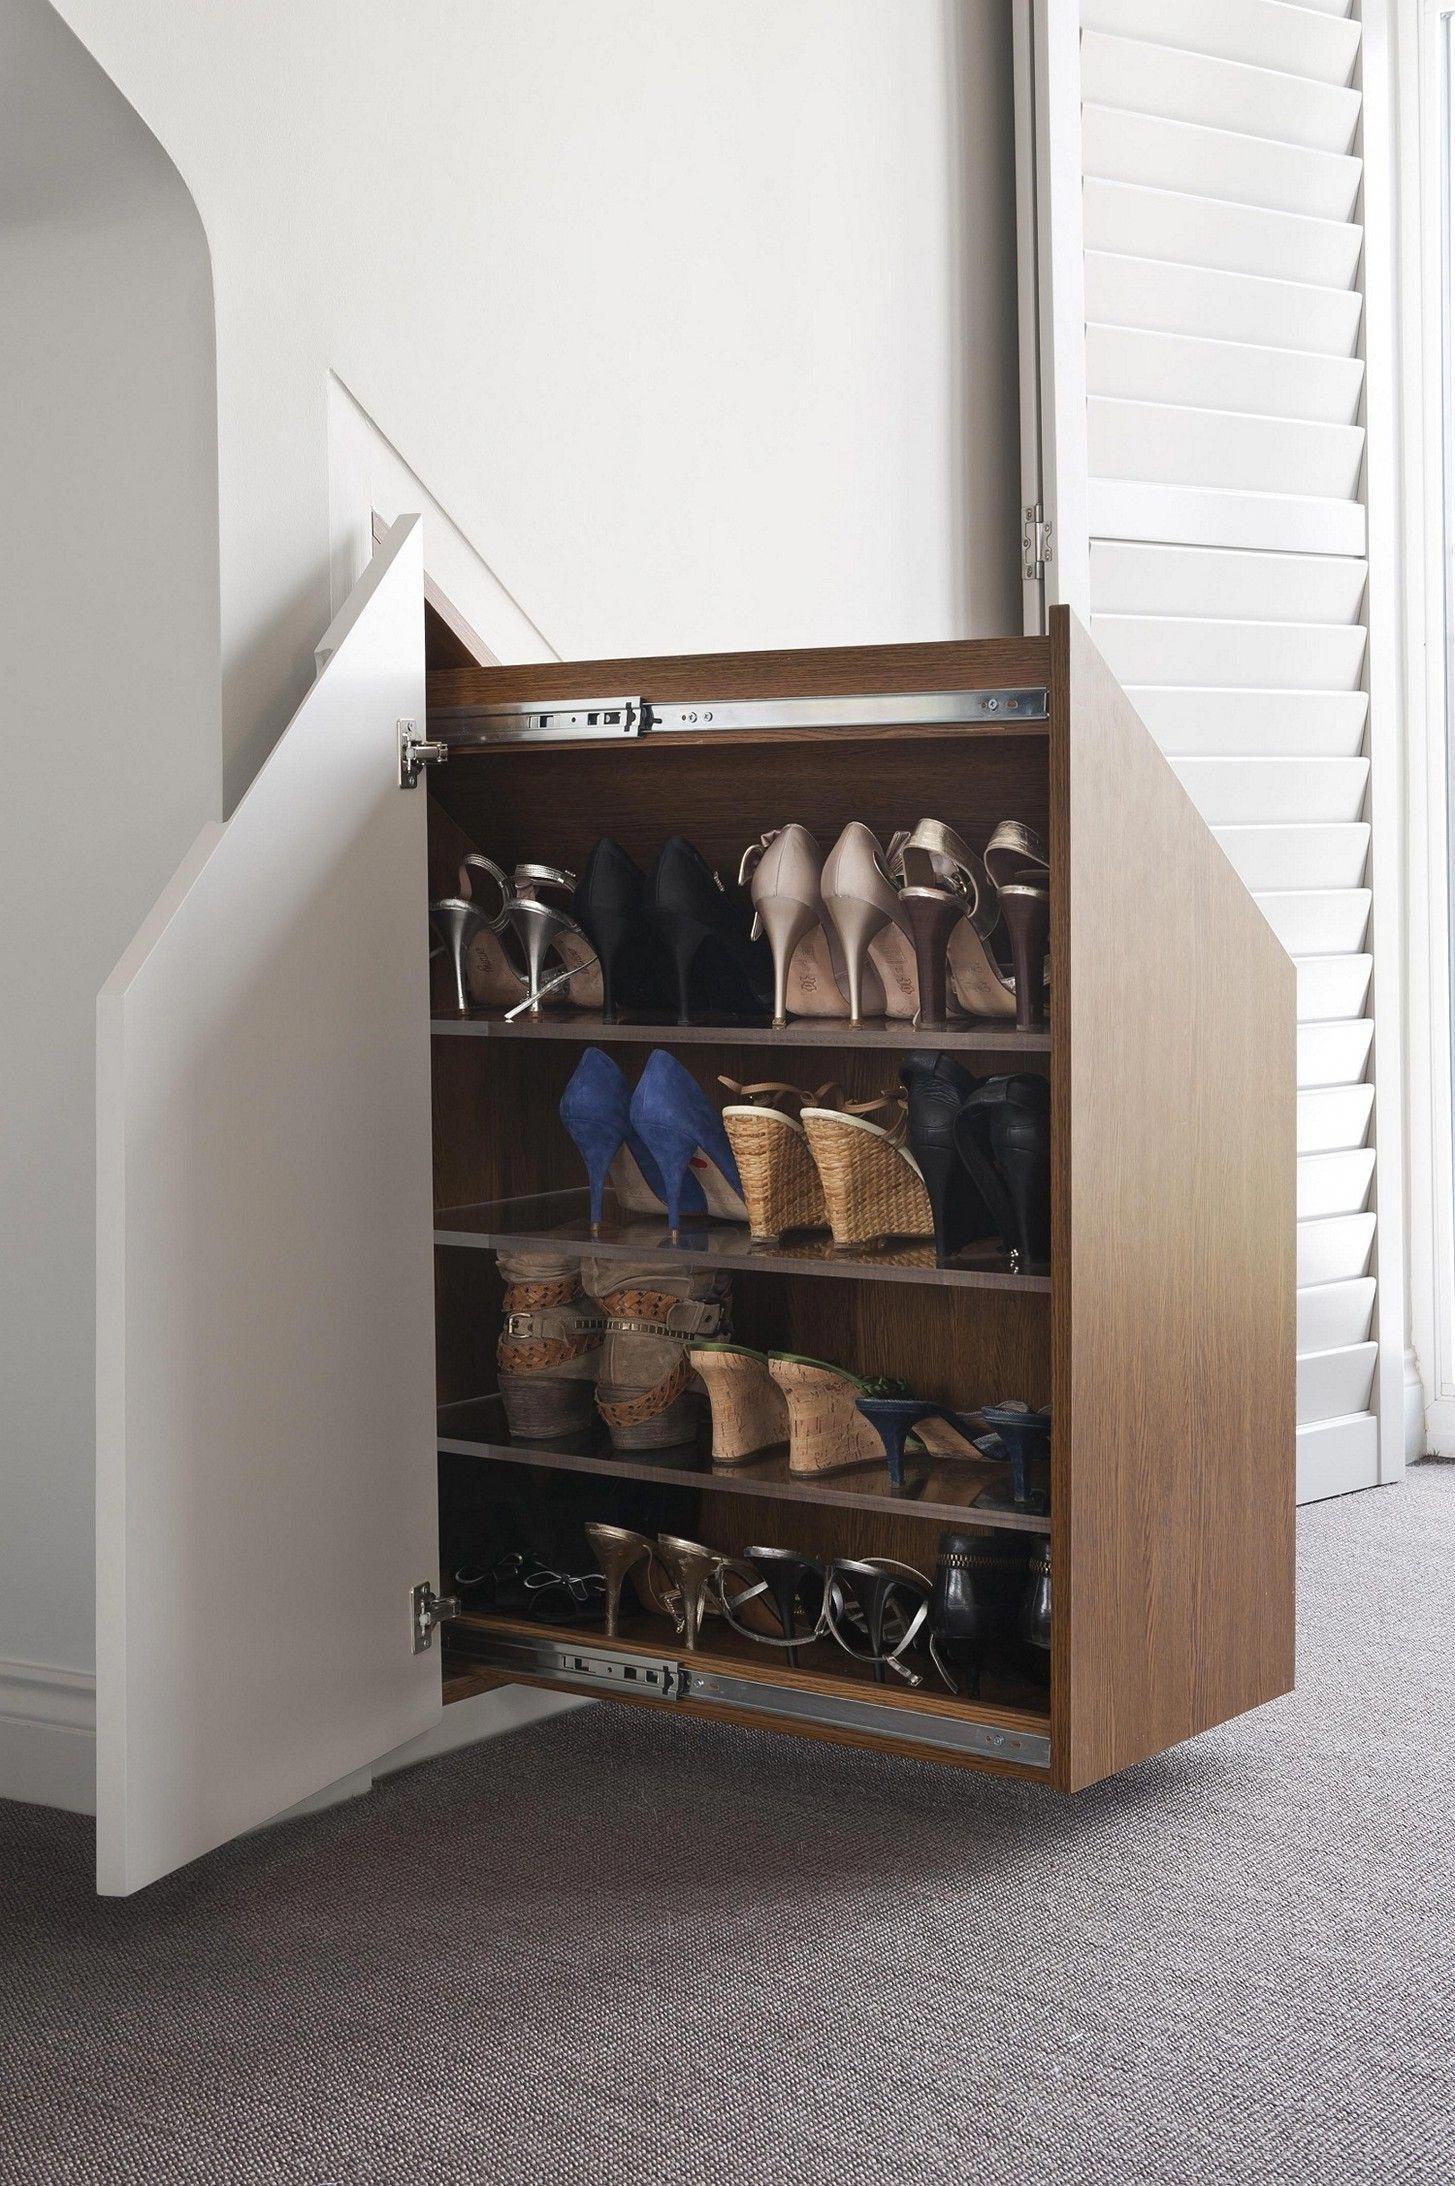 The Shoe Storage Ideas That Maximizes Home Space